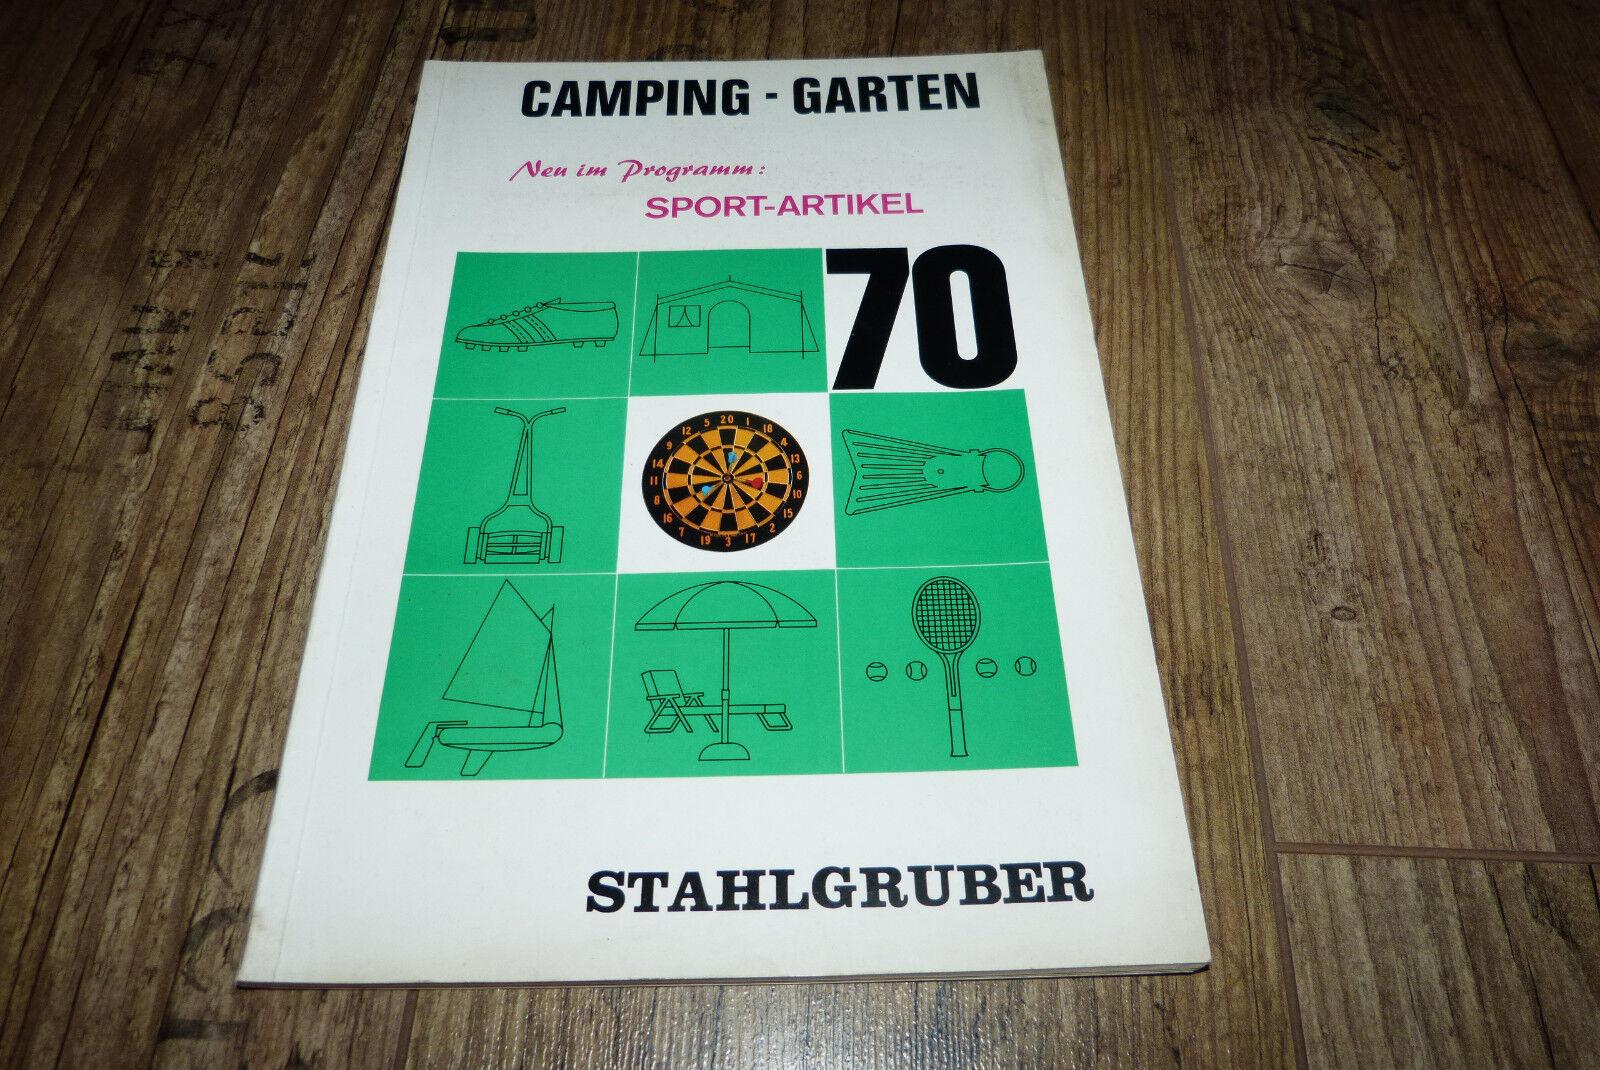 Camping Garten Sport Artikel  Katalog 1970 Zelte,Stiefele,Rasenmäher  usw